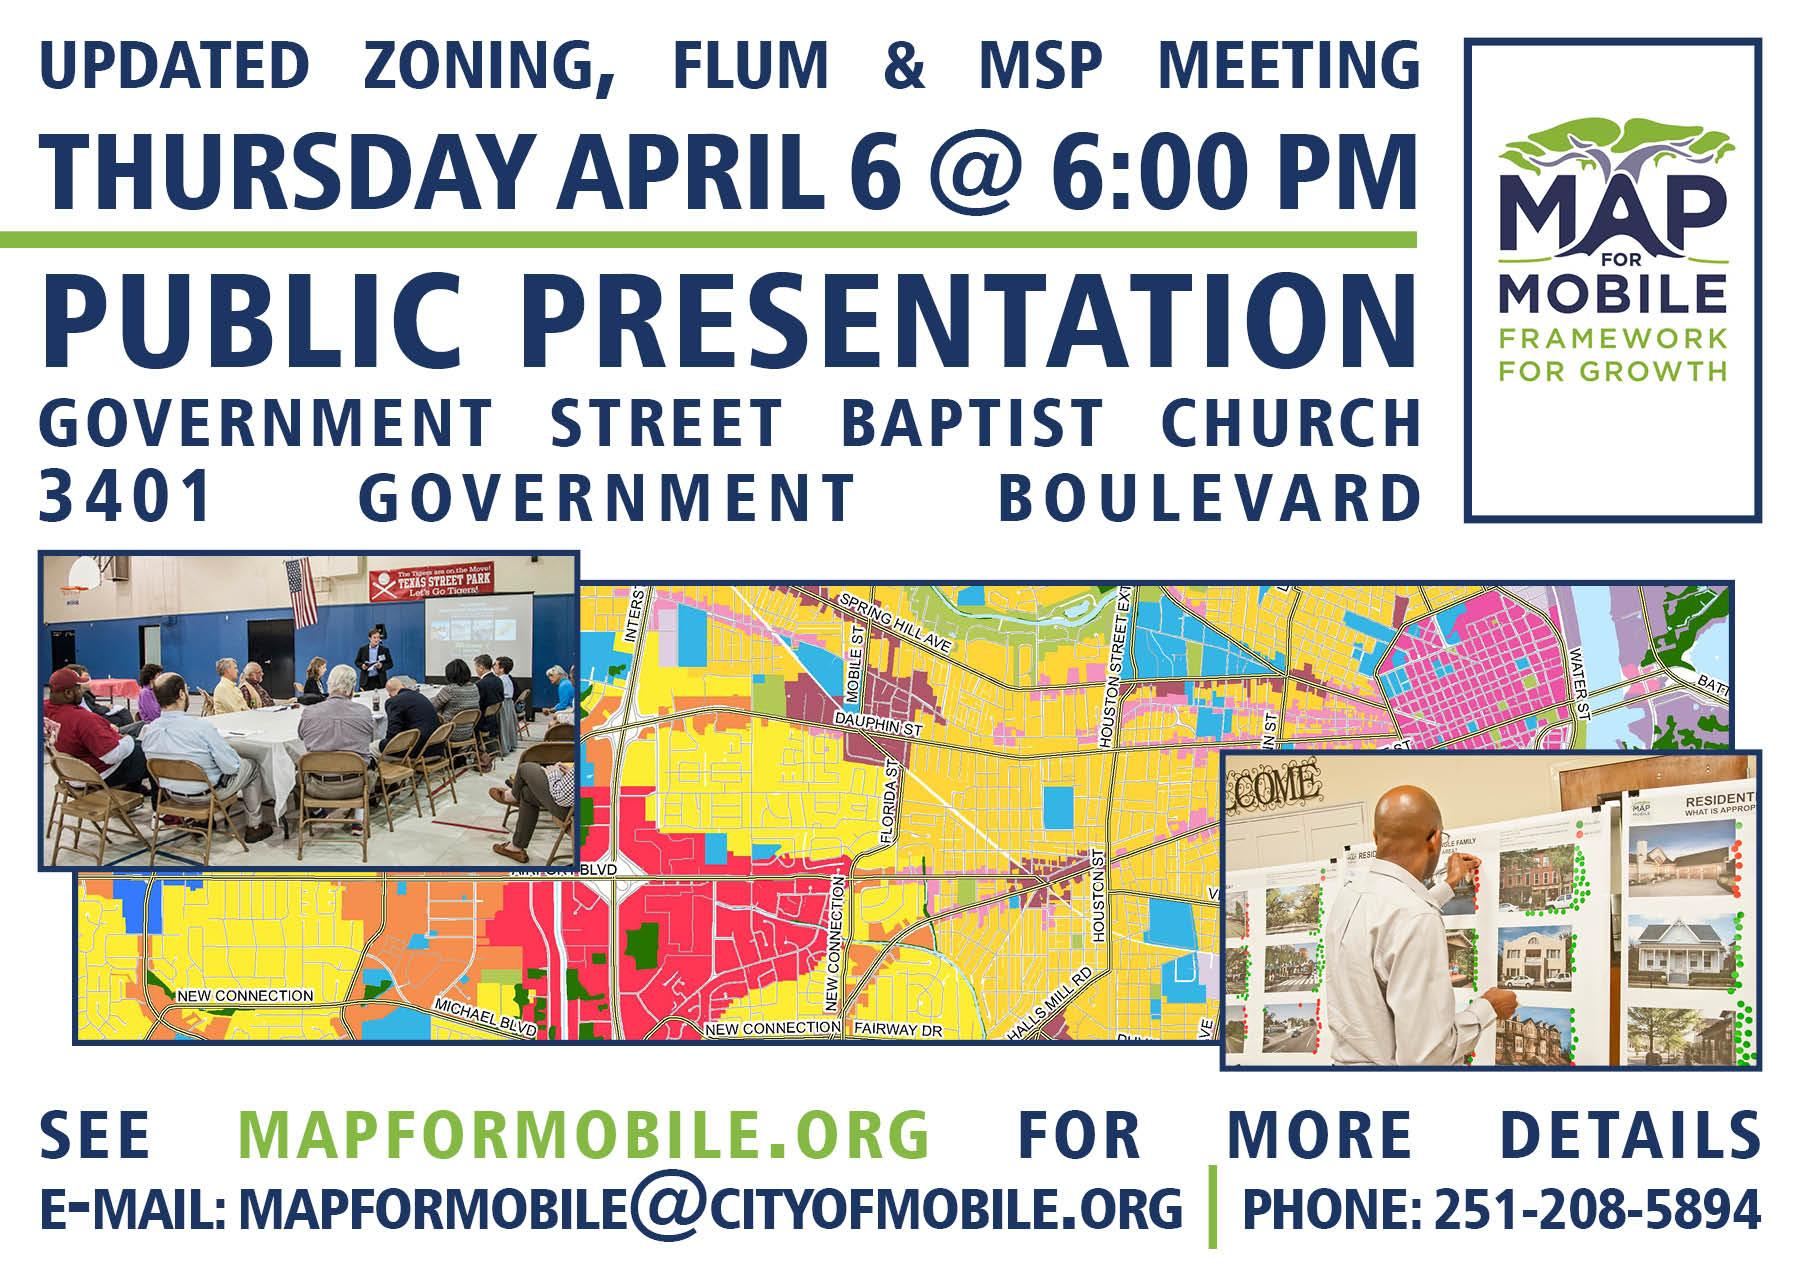 Updated Zoning, FLUM & MSP Meeting